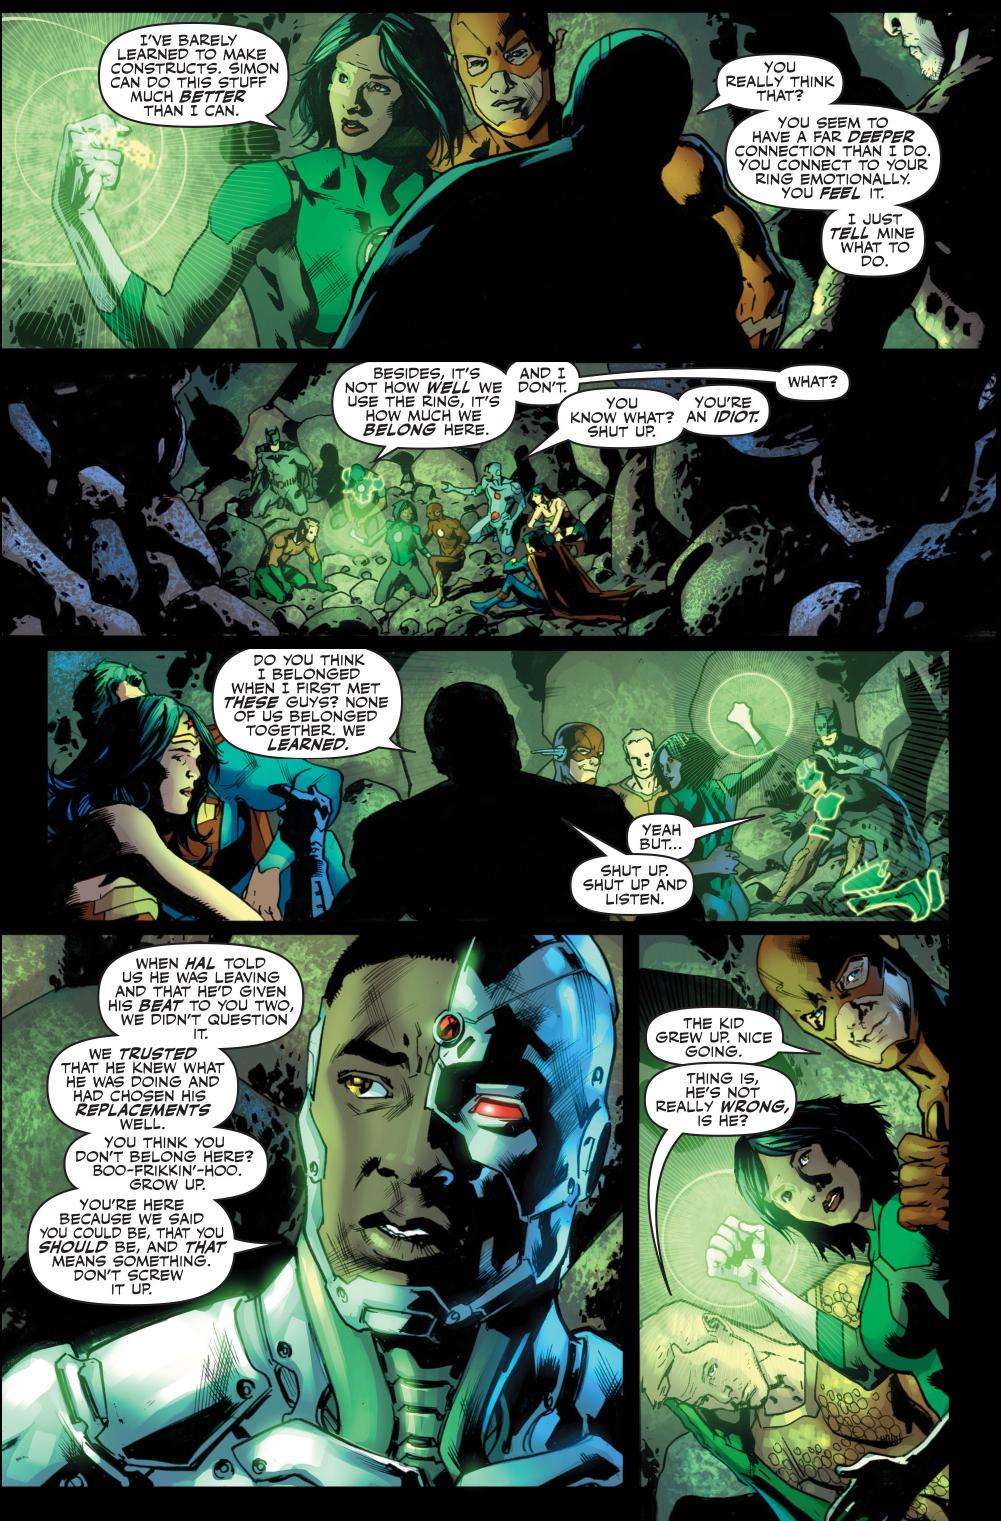 cyborg-tells-the-green-lanterns-to-grow-a-pair